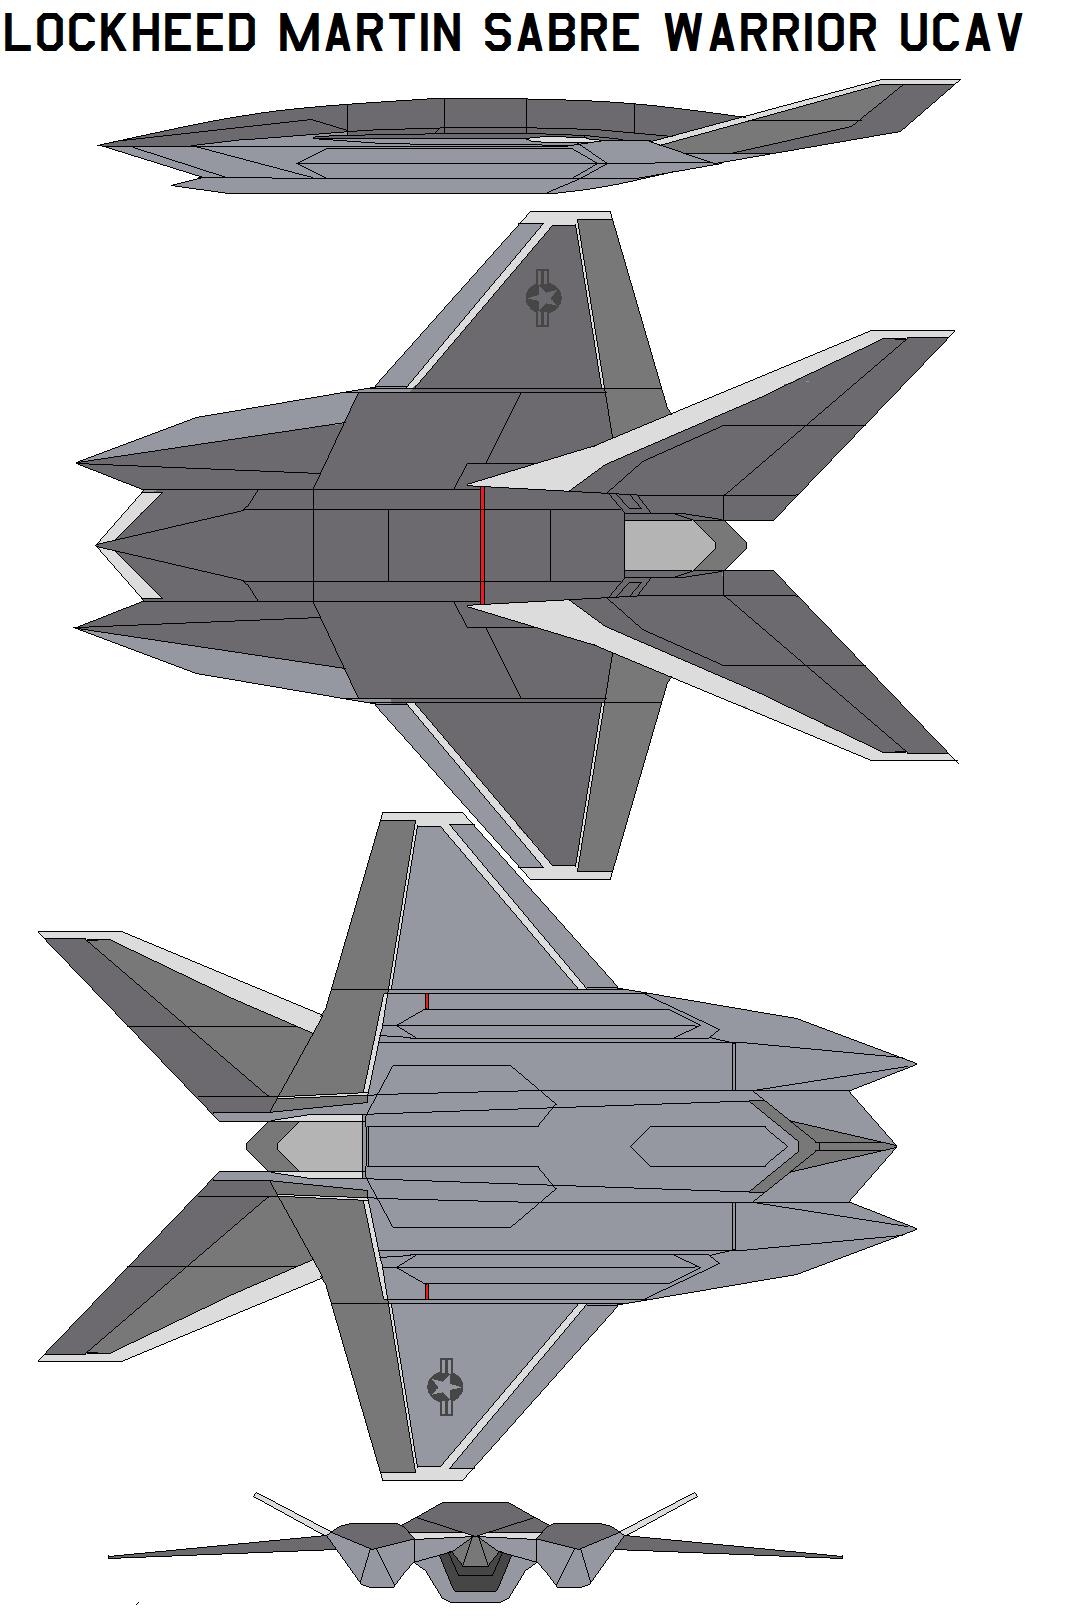 Lockheed Martin Sabre Warrior UCAV by bagera3005